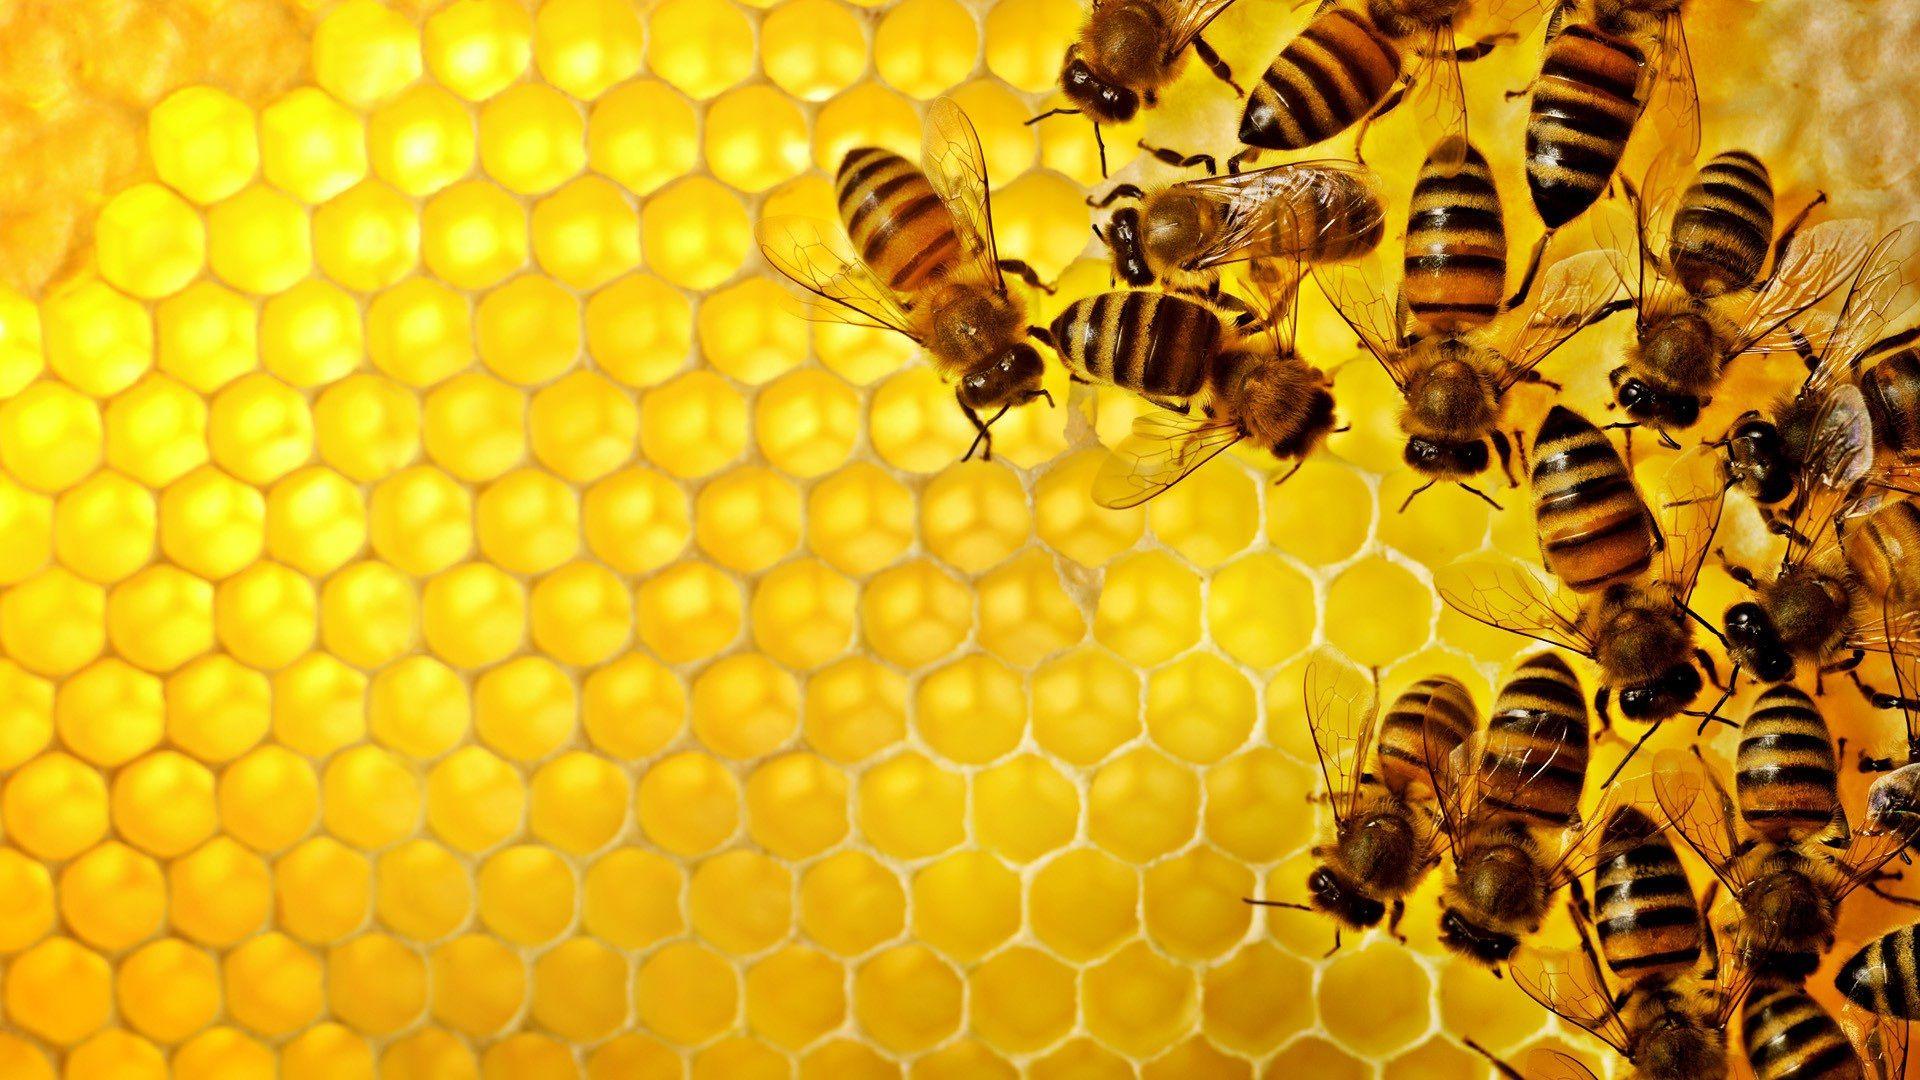 Pin by KRISTINA MELNIK on YELLOW Bee propolis, Honey